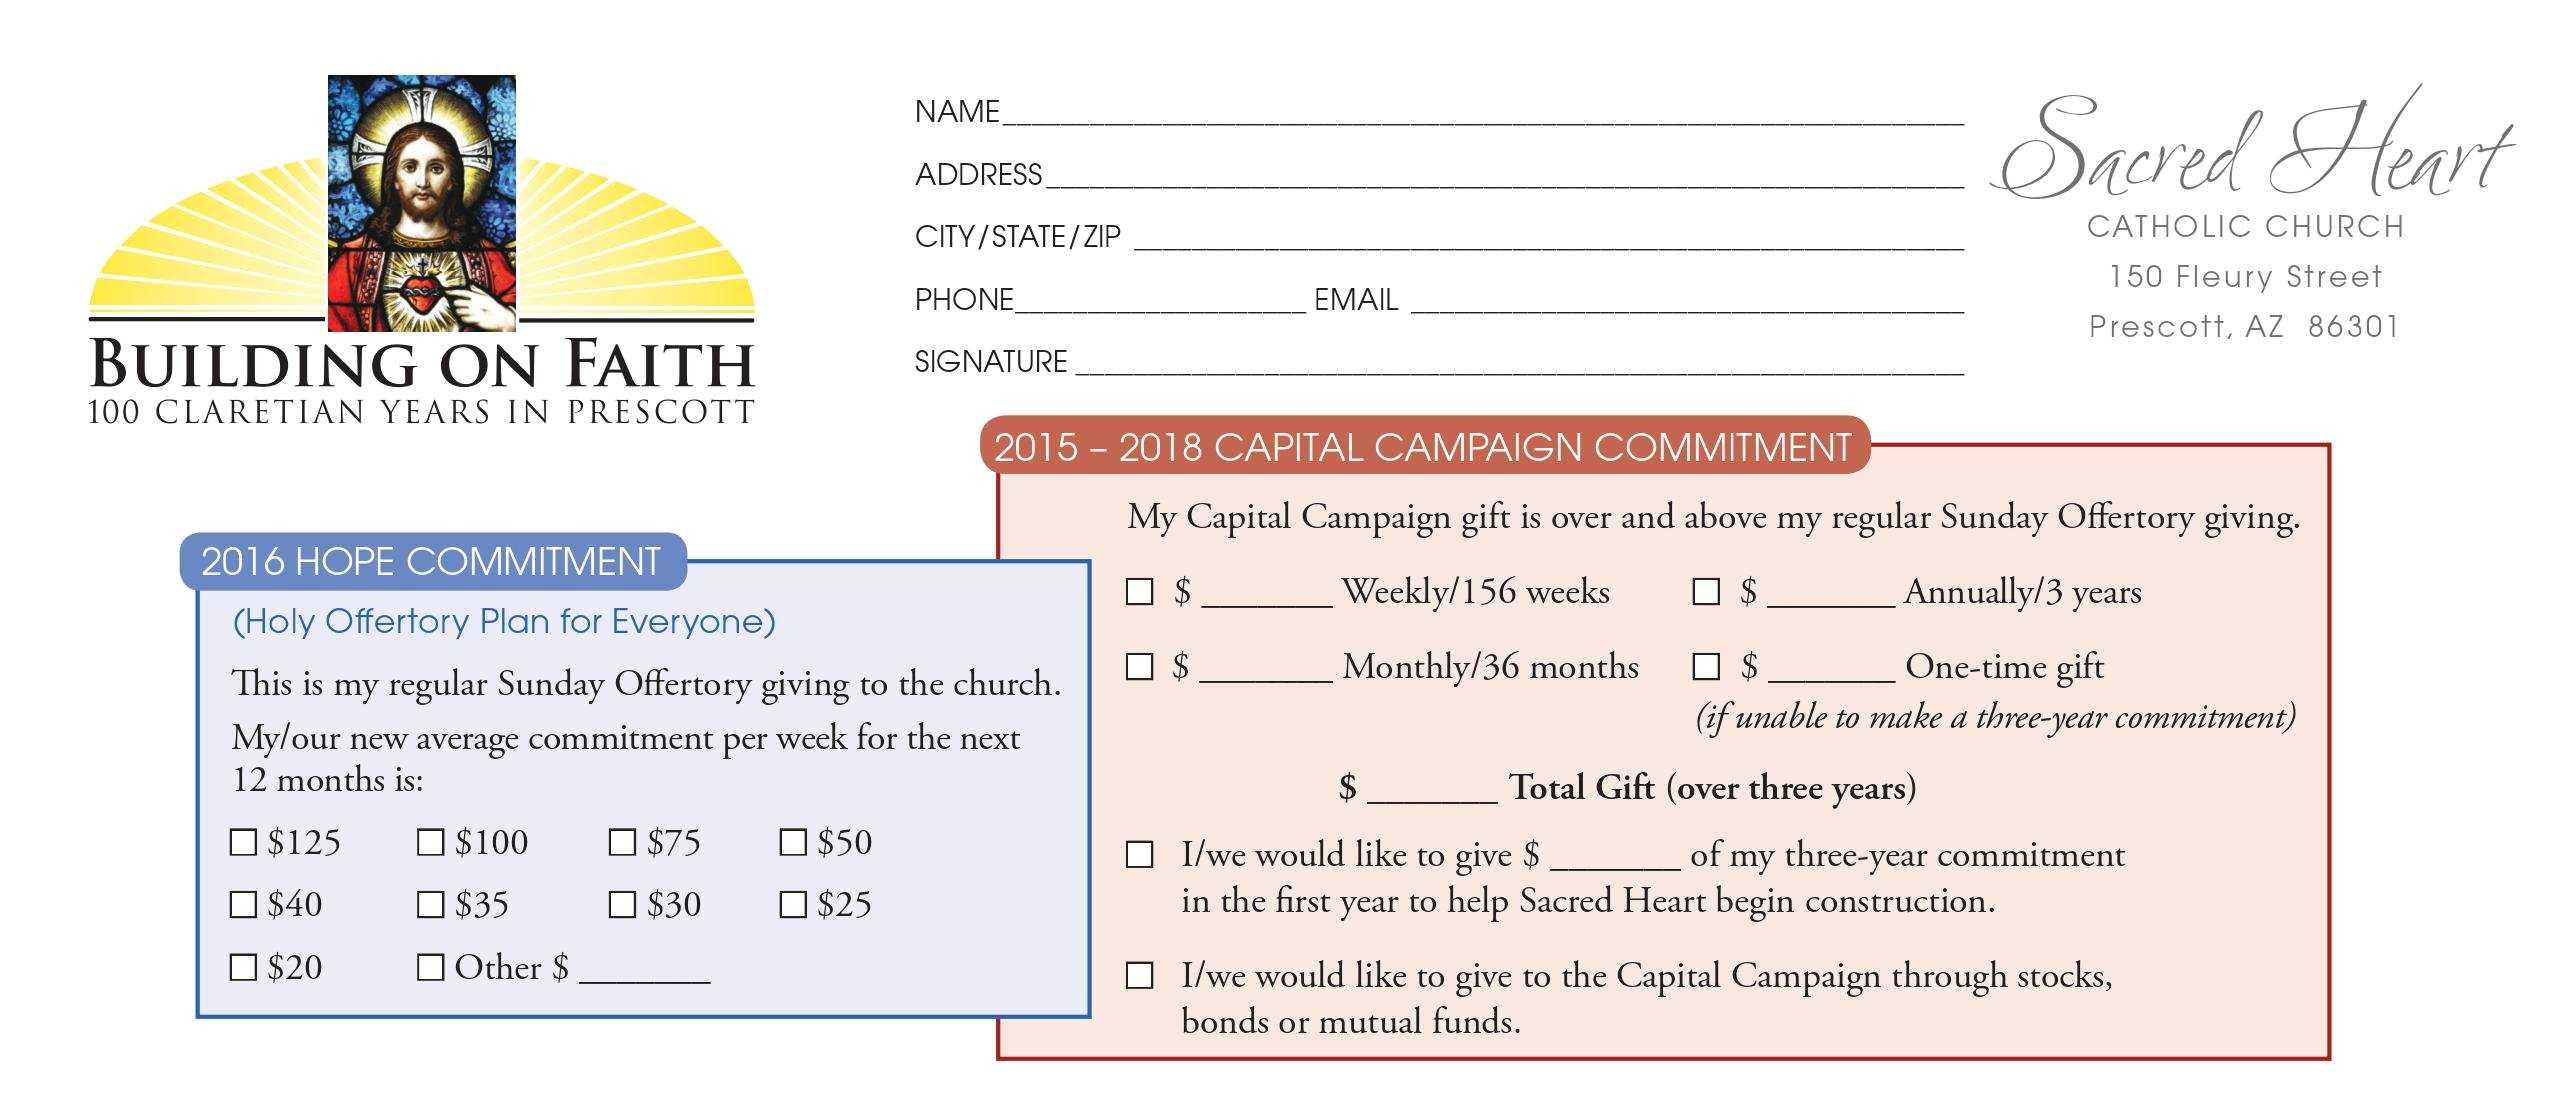 Pledge Card Sample - Colona.rsd7 With Fundraising Pledge Card Template